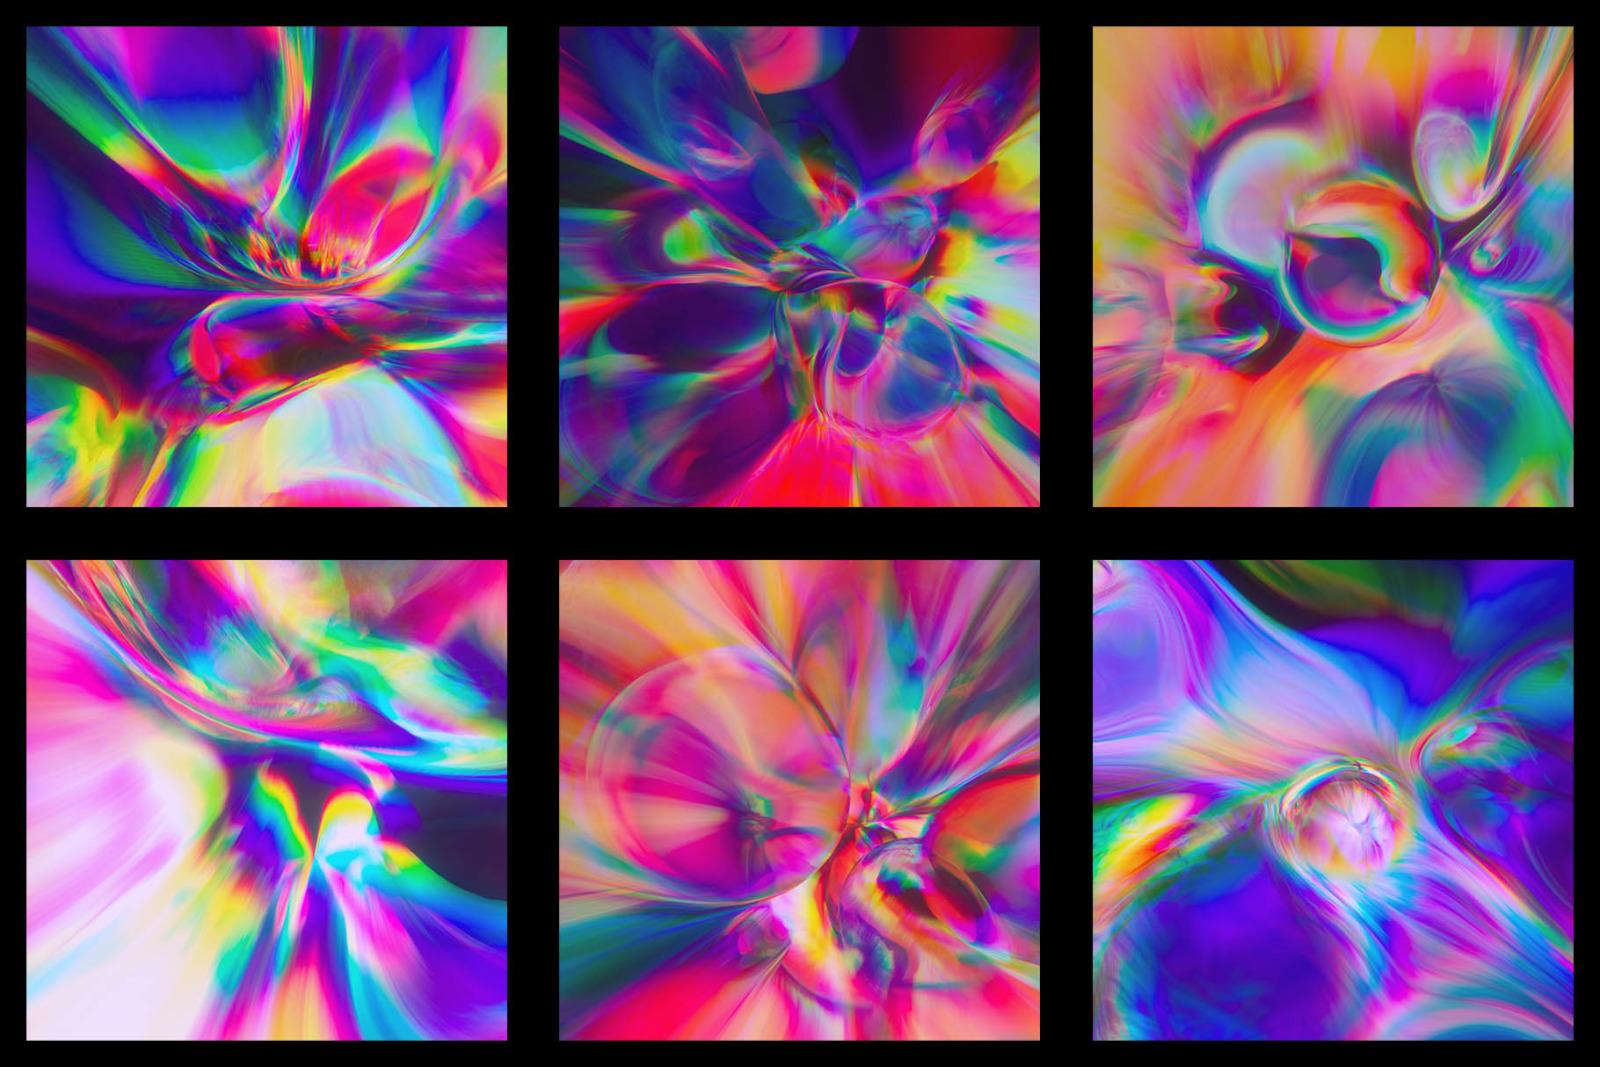 Delirium: Abstract Chromatic Aberration